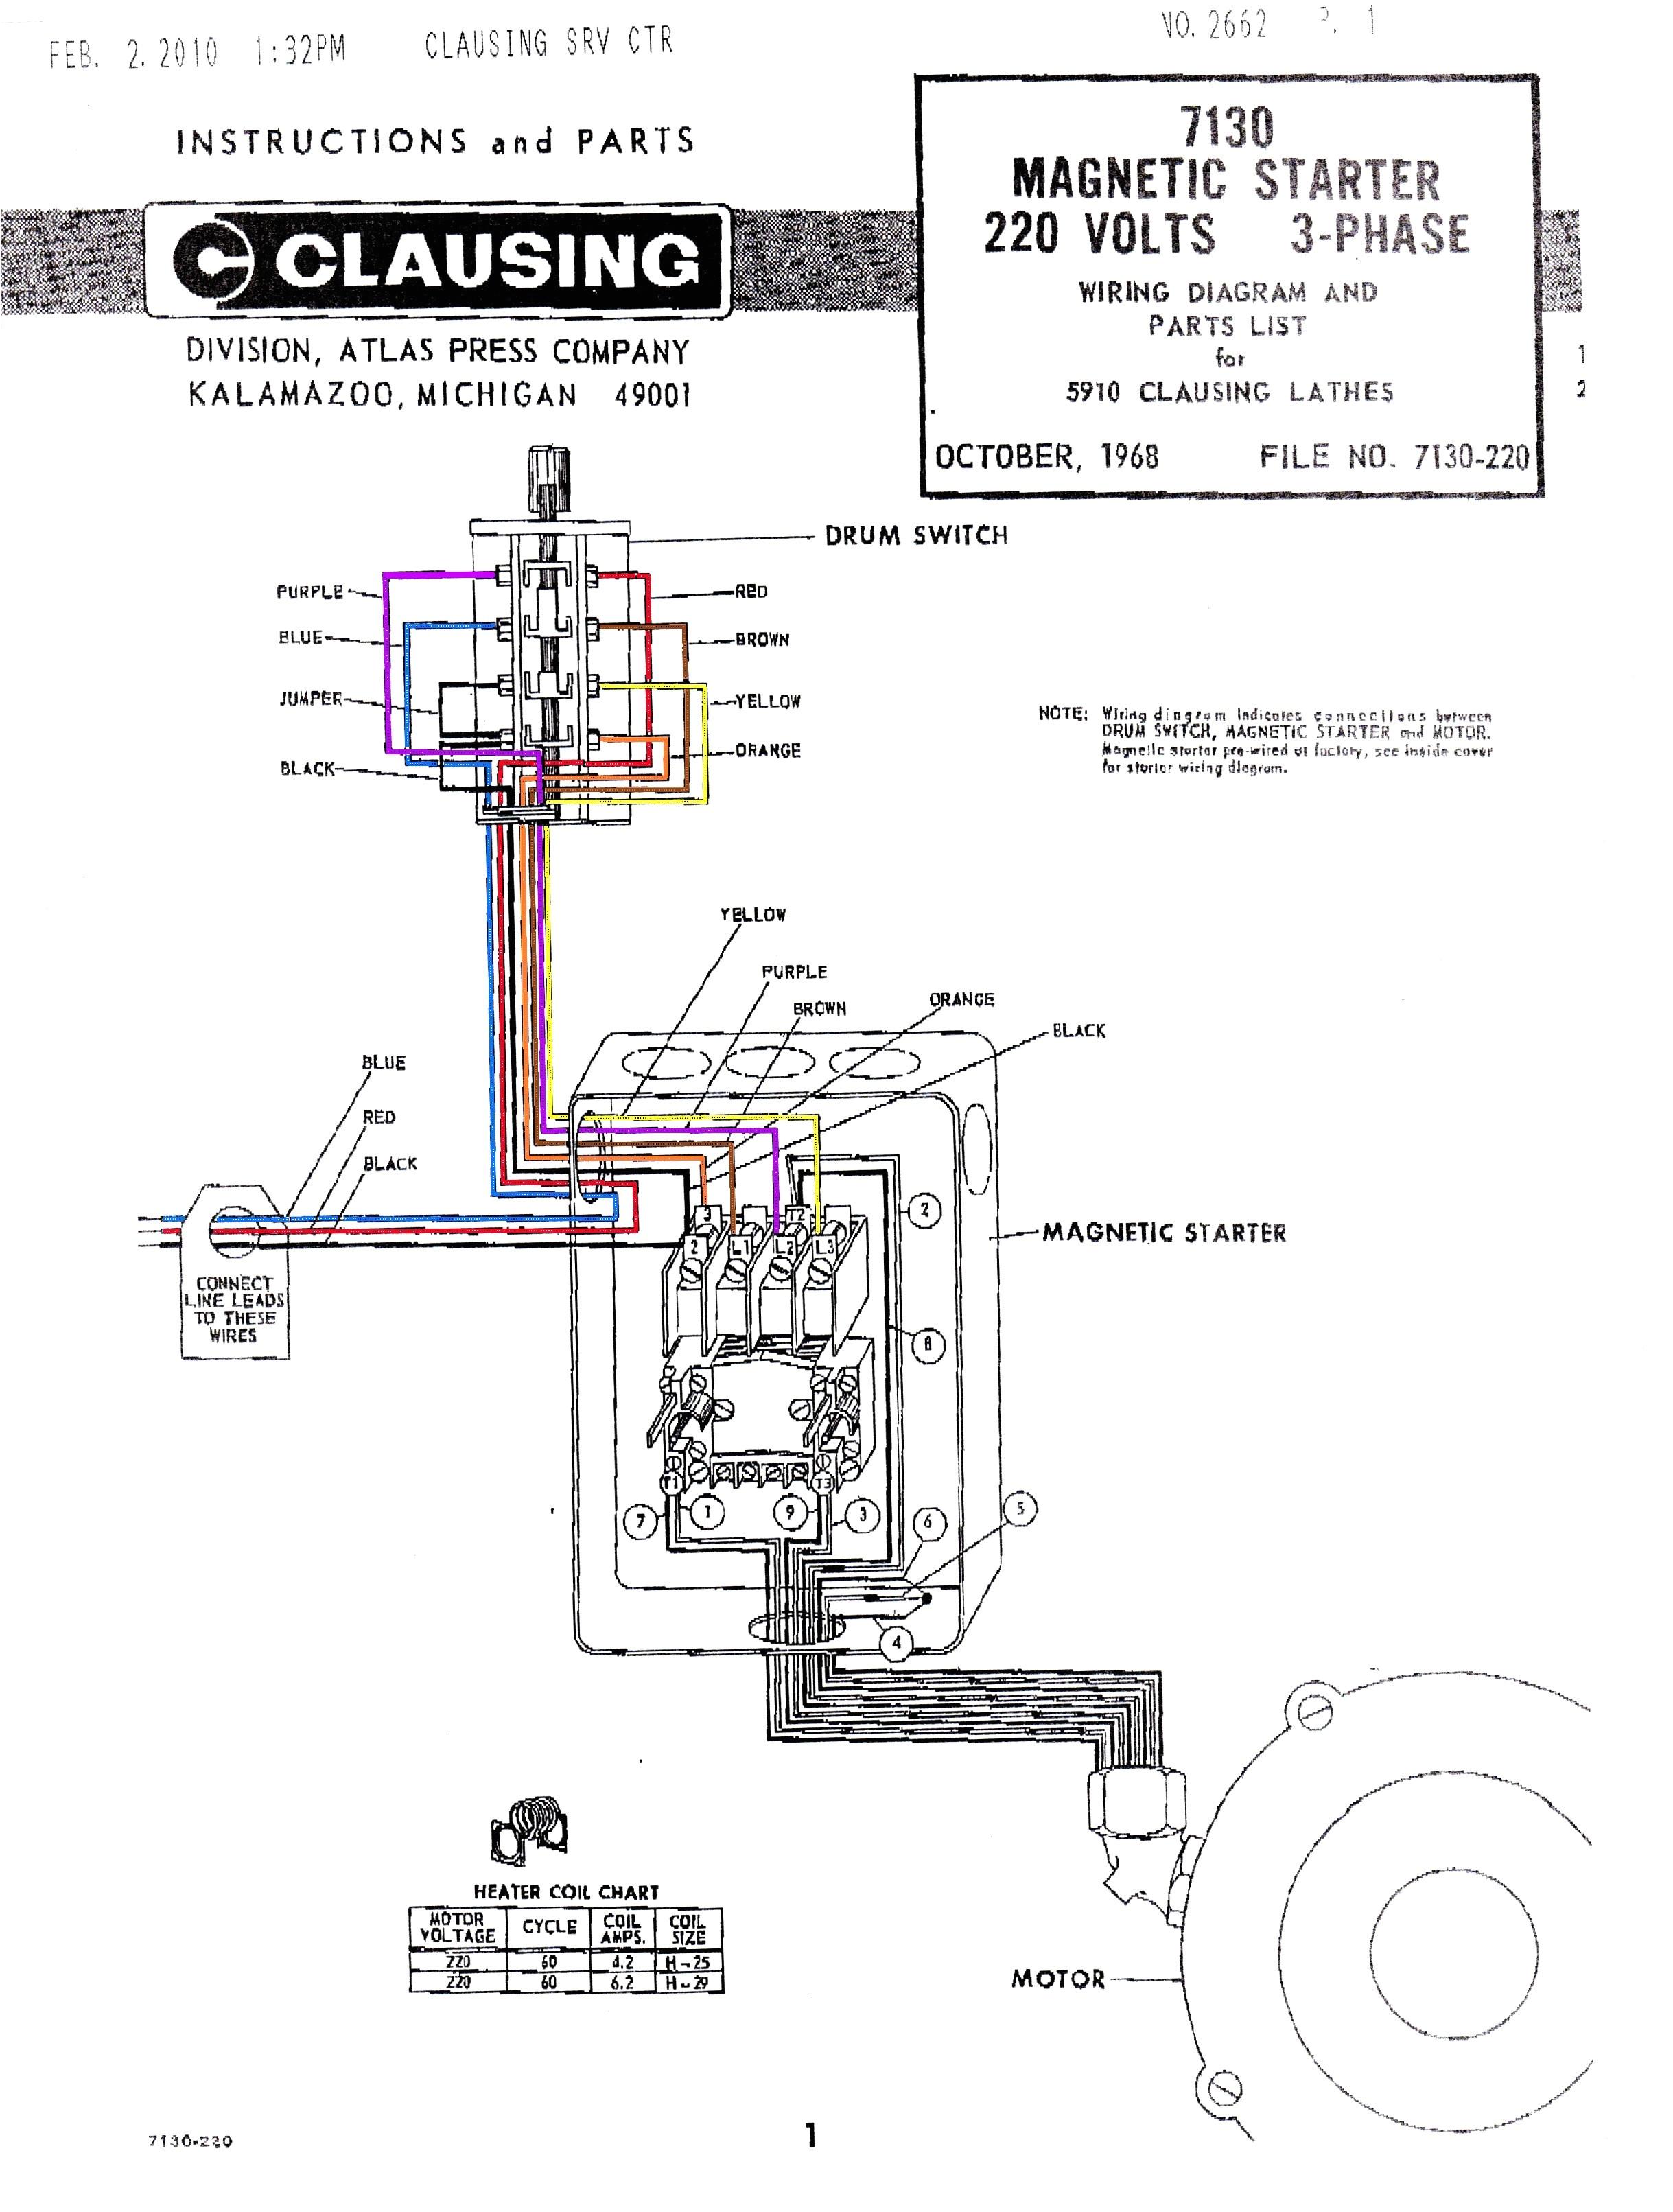 toshiba alternator wiring diagram wiring diagram toolboxtoshiba soft start wiring diagrams wiring diagram query toshiba alternator